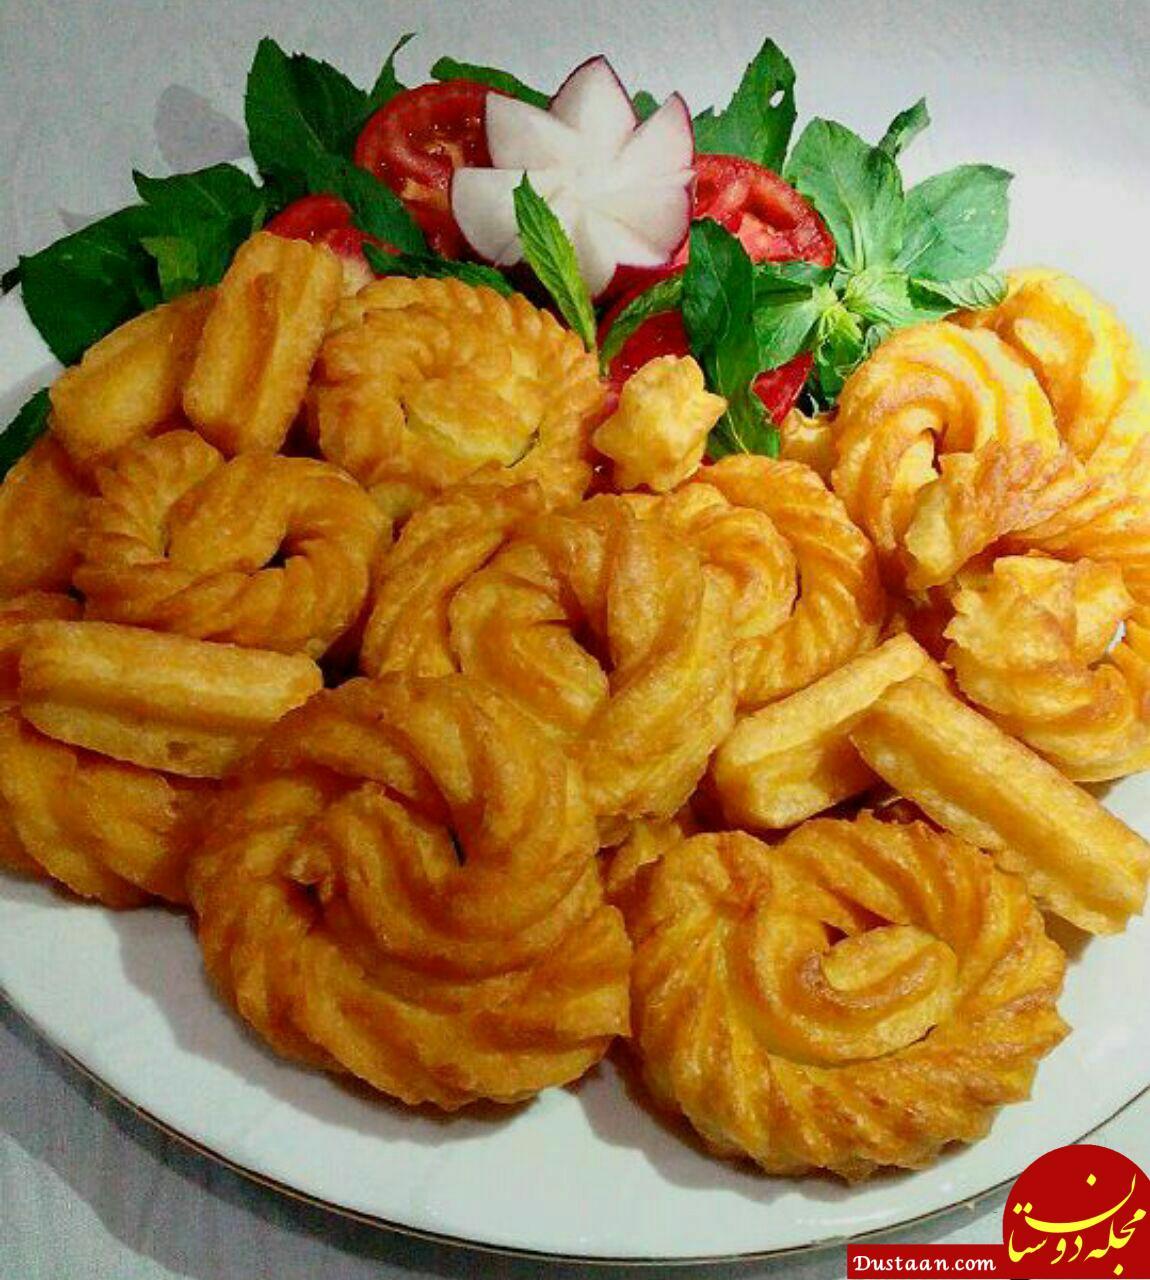 www.dustaan.com طرز تهیه بامیه سیب زمینی به روشی متفاوت و خوشمزه